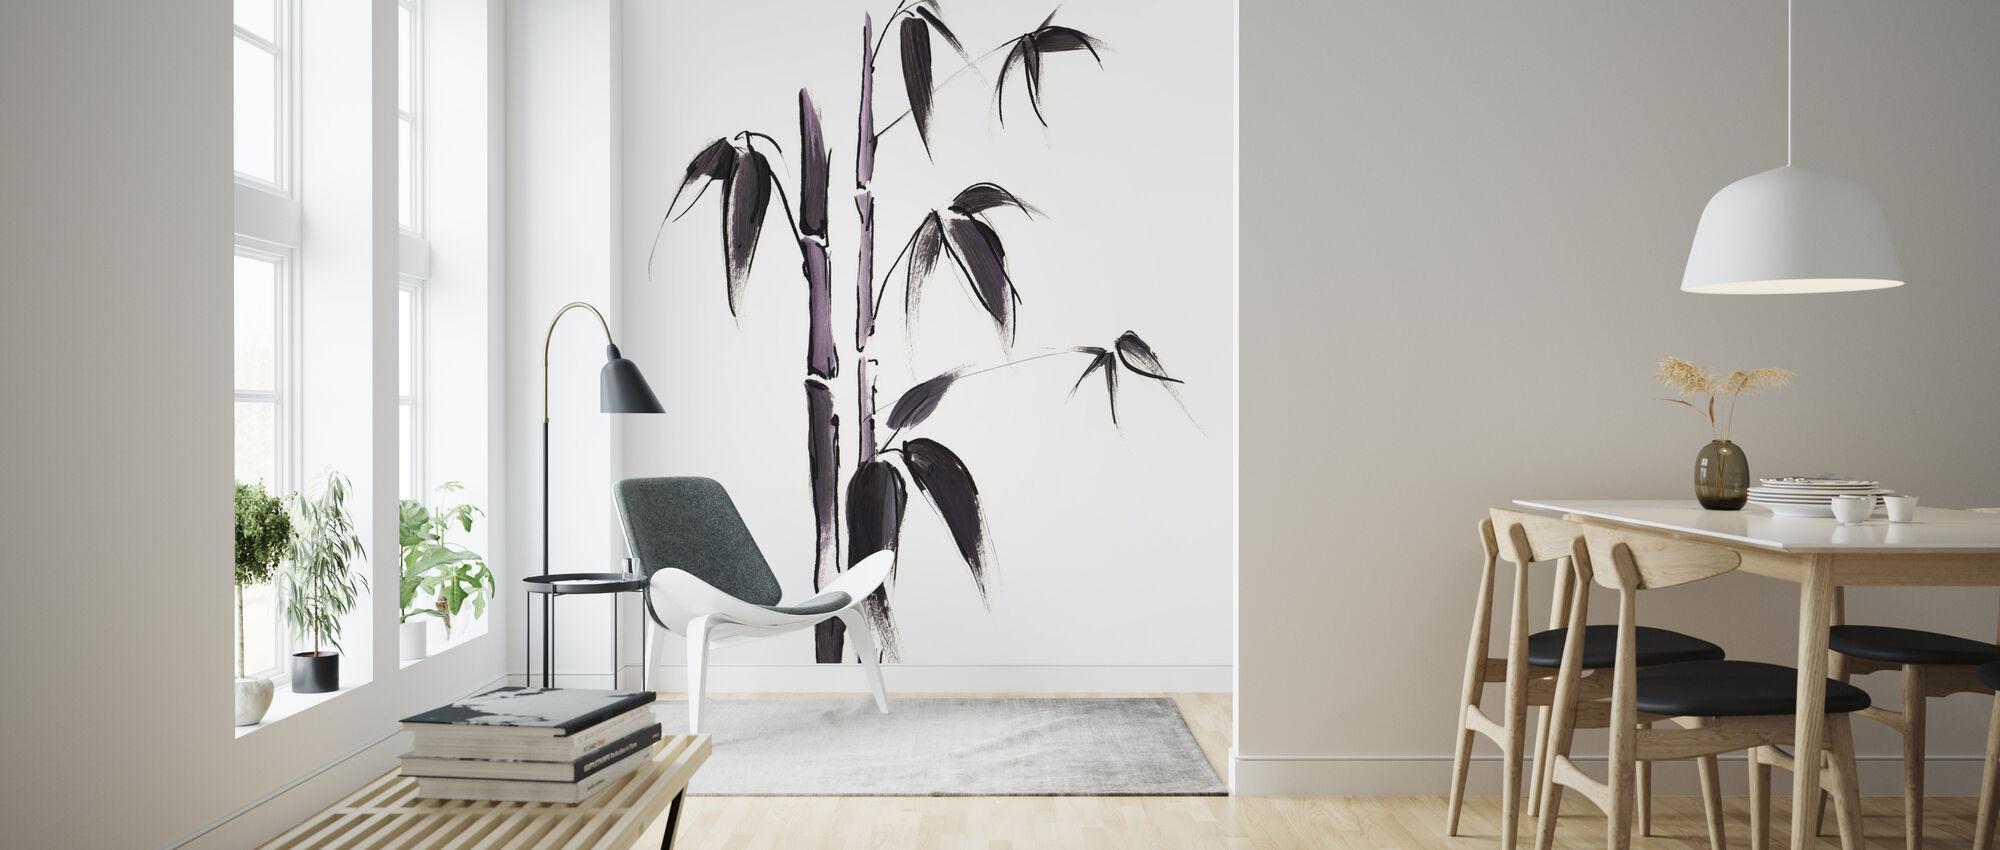 Bamboe Illustratie - Behang - Woonkamer